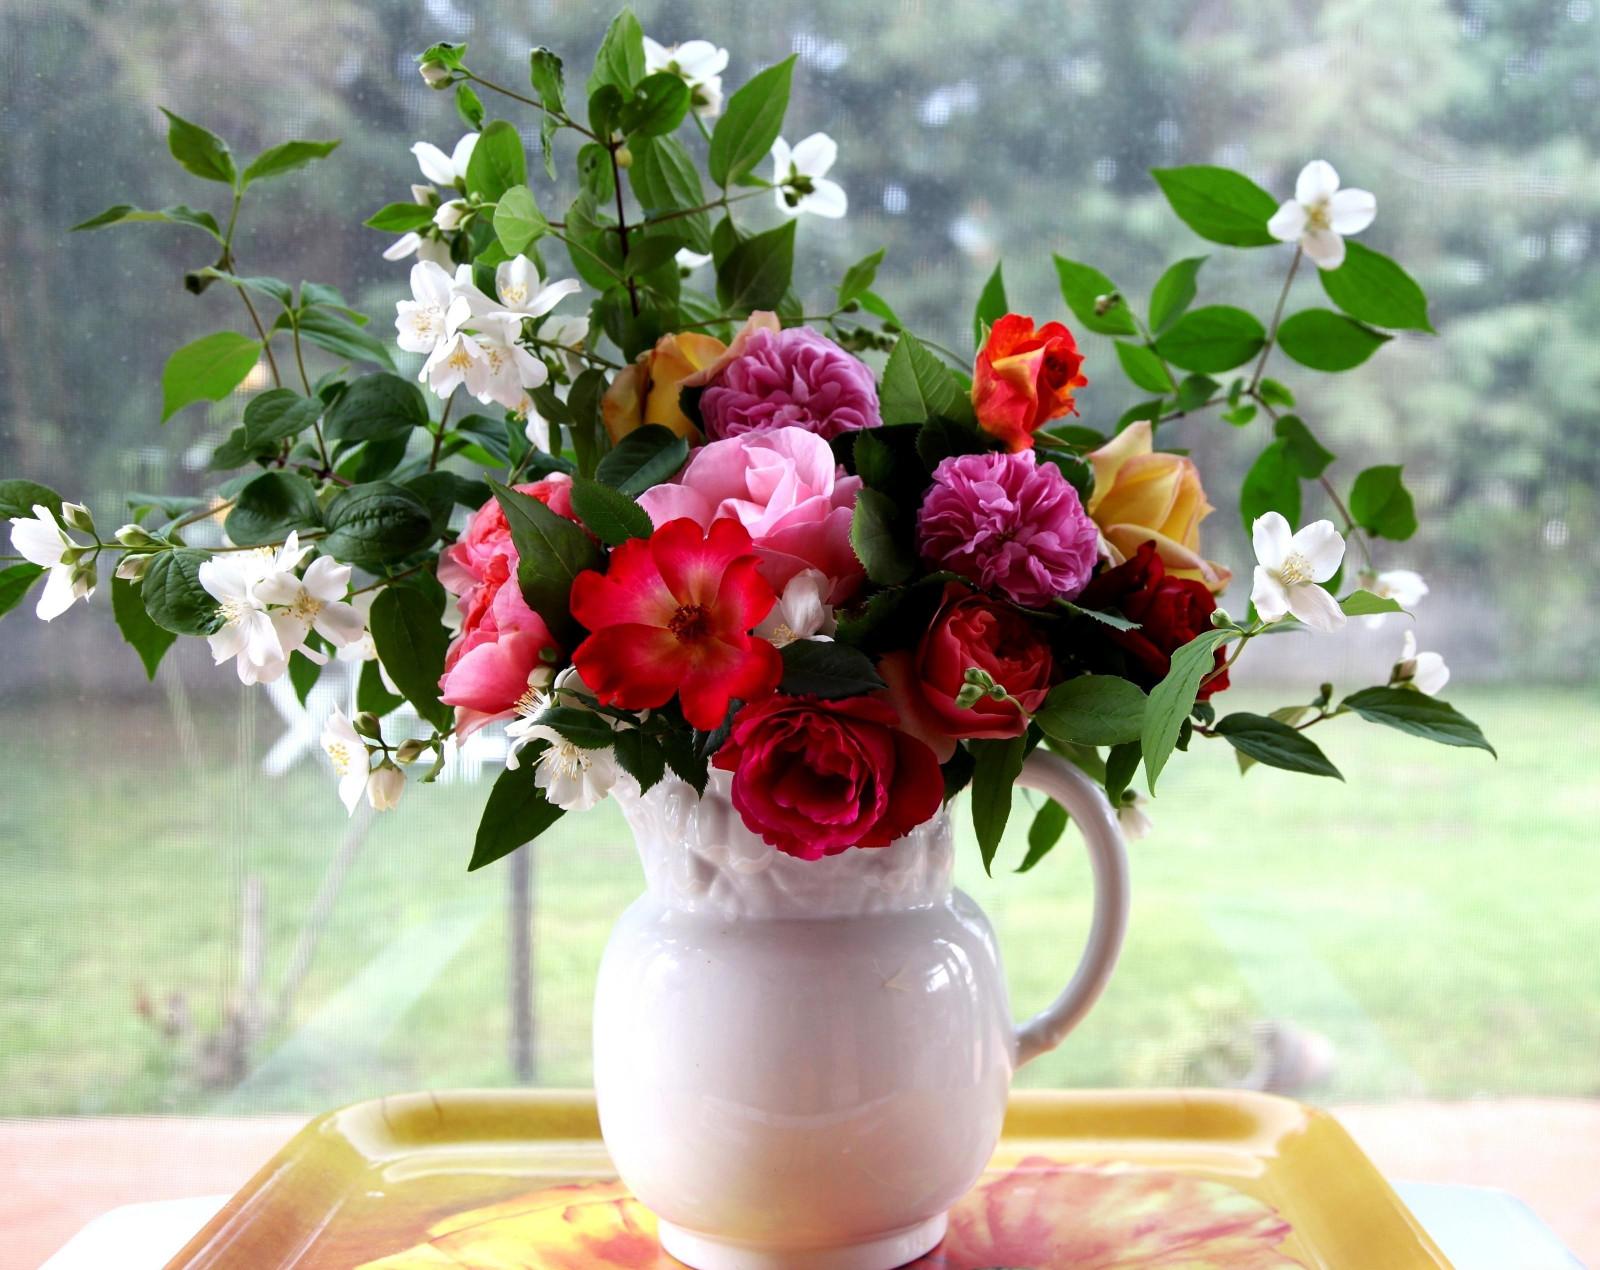 rose_jasmine_bouquet_pitcher_tray_box_branches-1082955.jpg!d